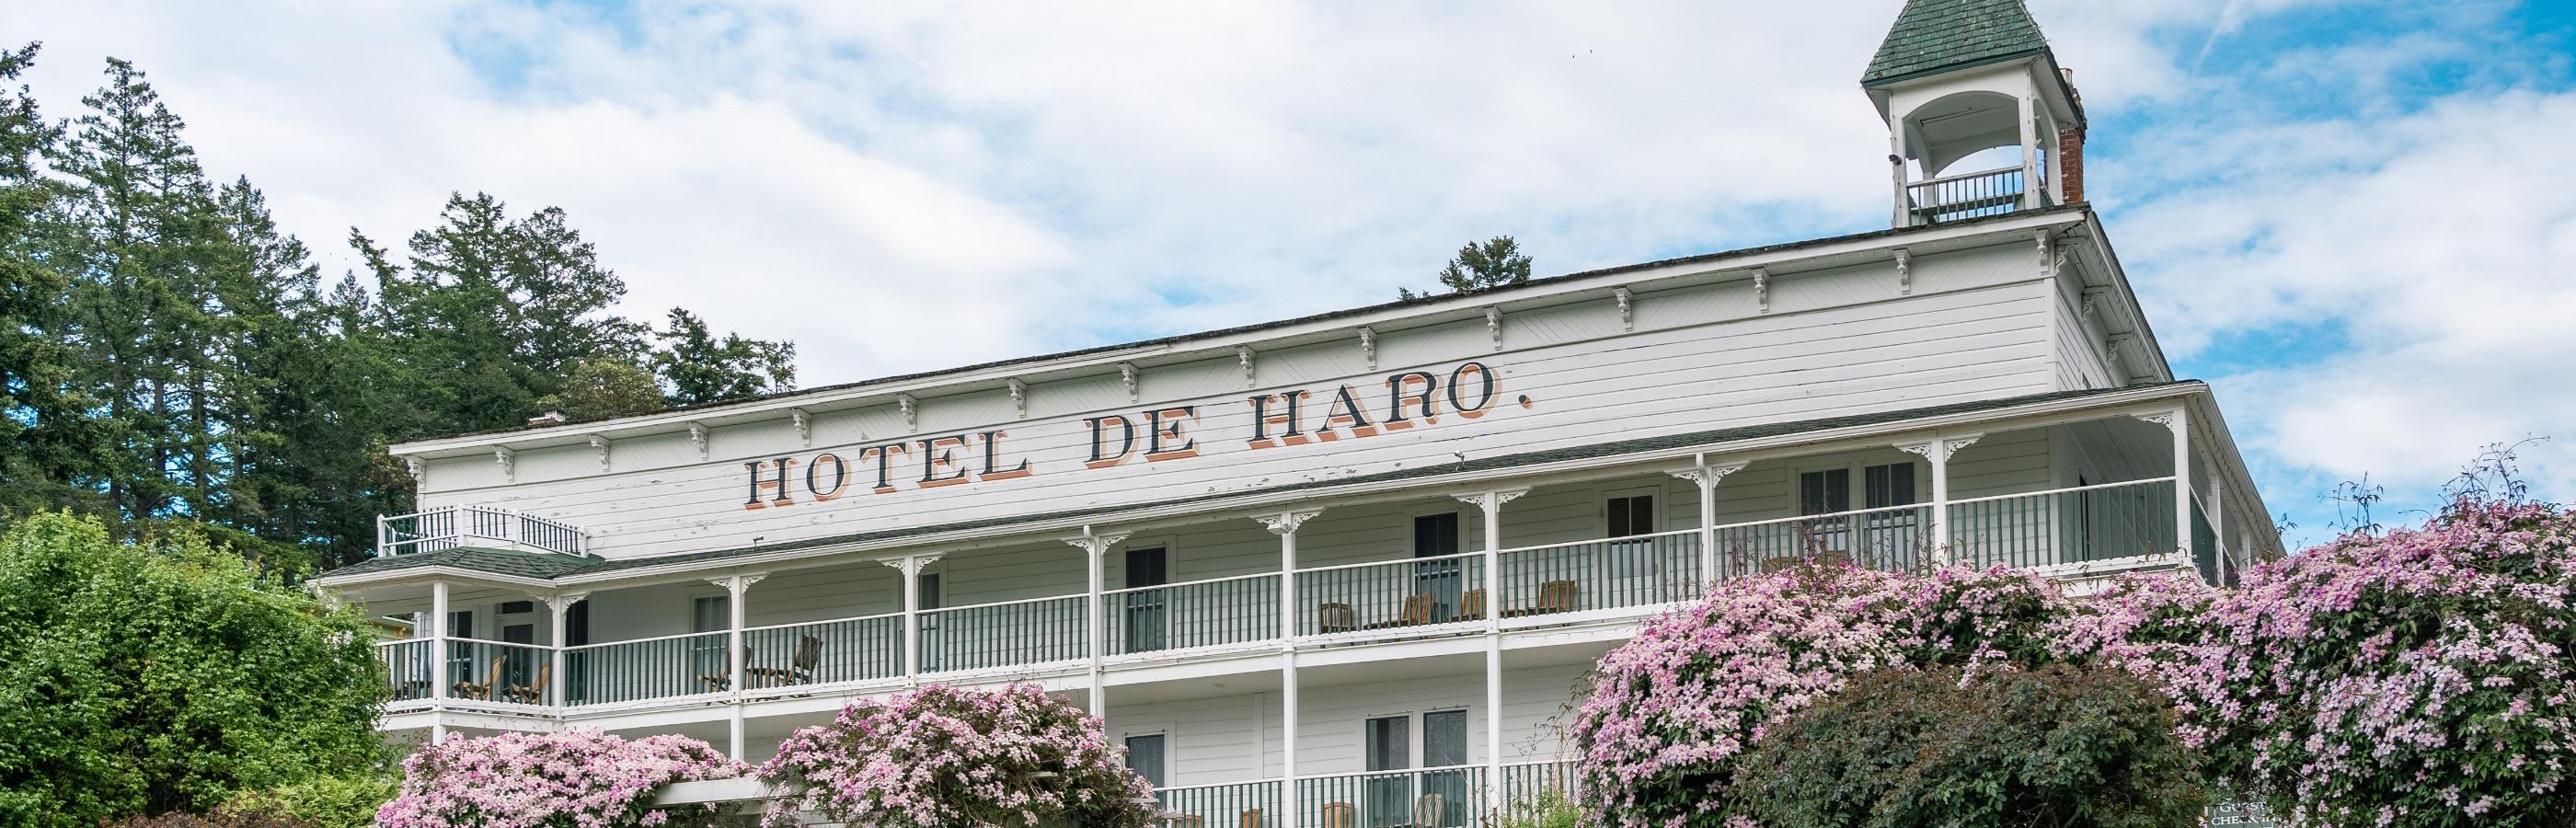 Hotels Inns Resorts In The San Juan